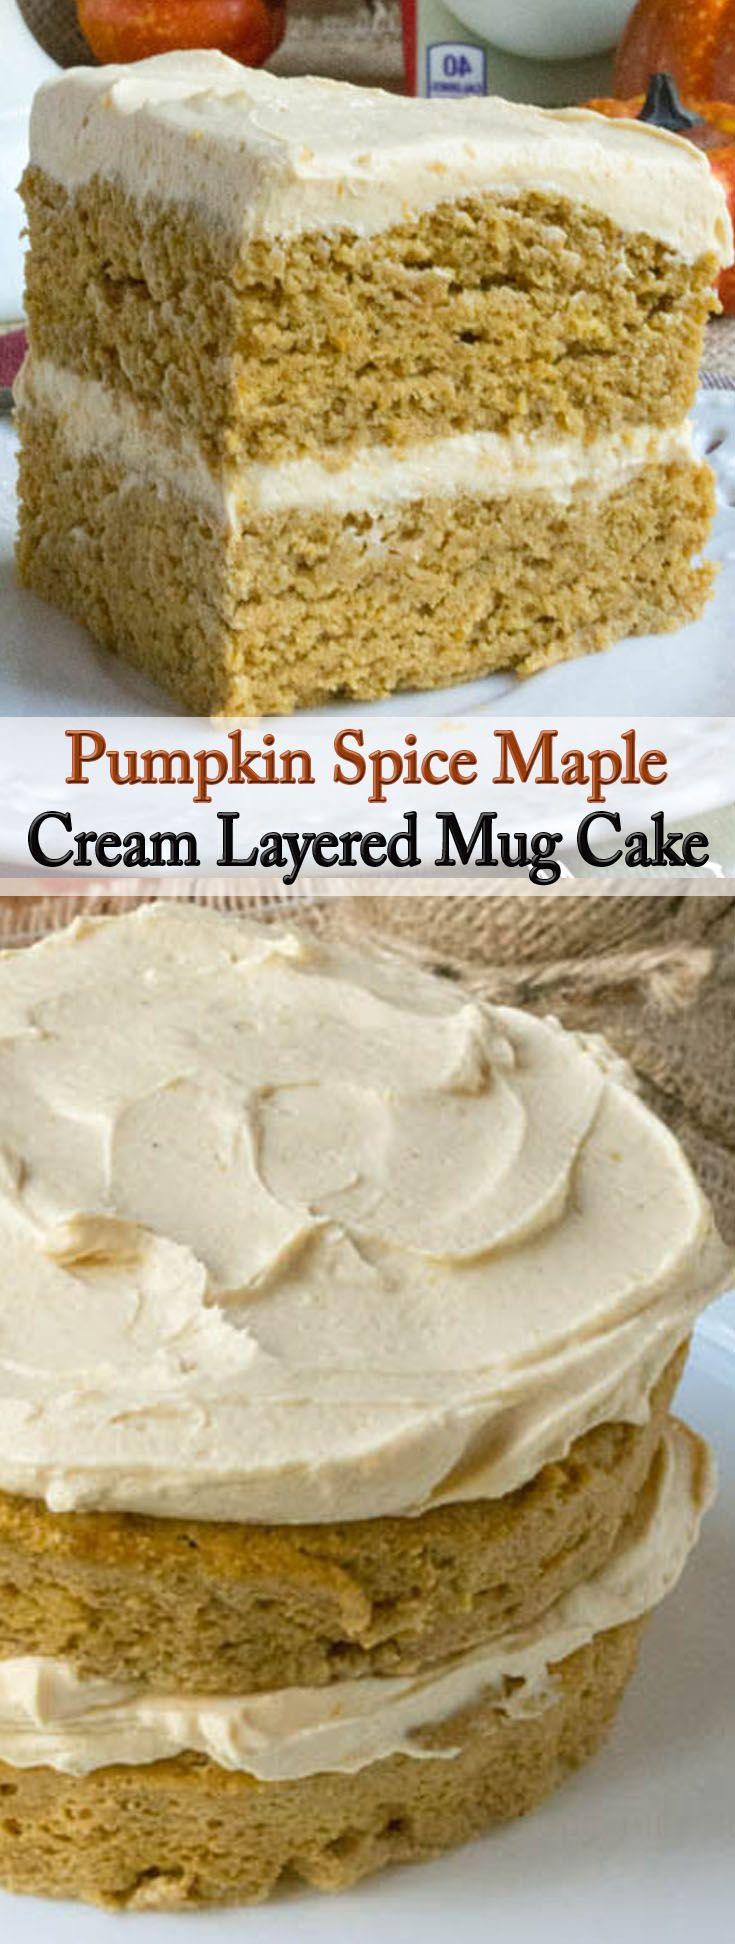 Pumpkin Spice Maple Cream Layered Mug Cake